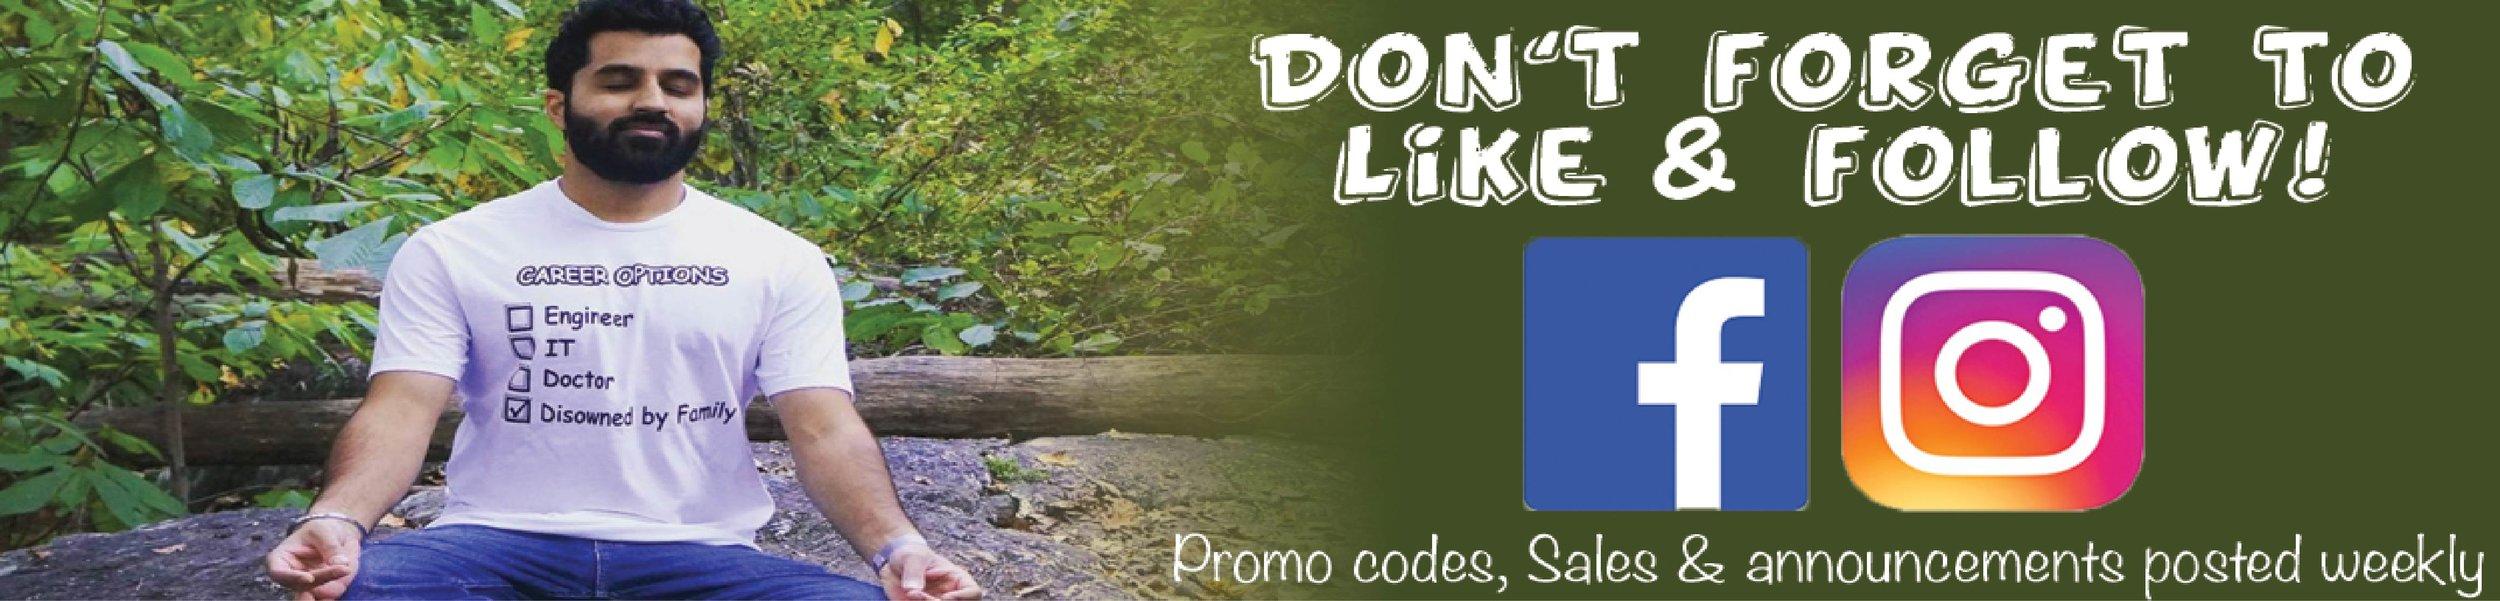 Social-Media-banner-#brownrangtees